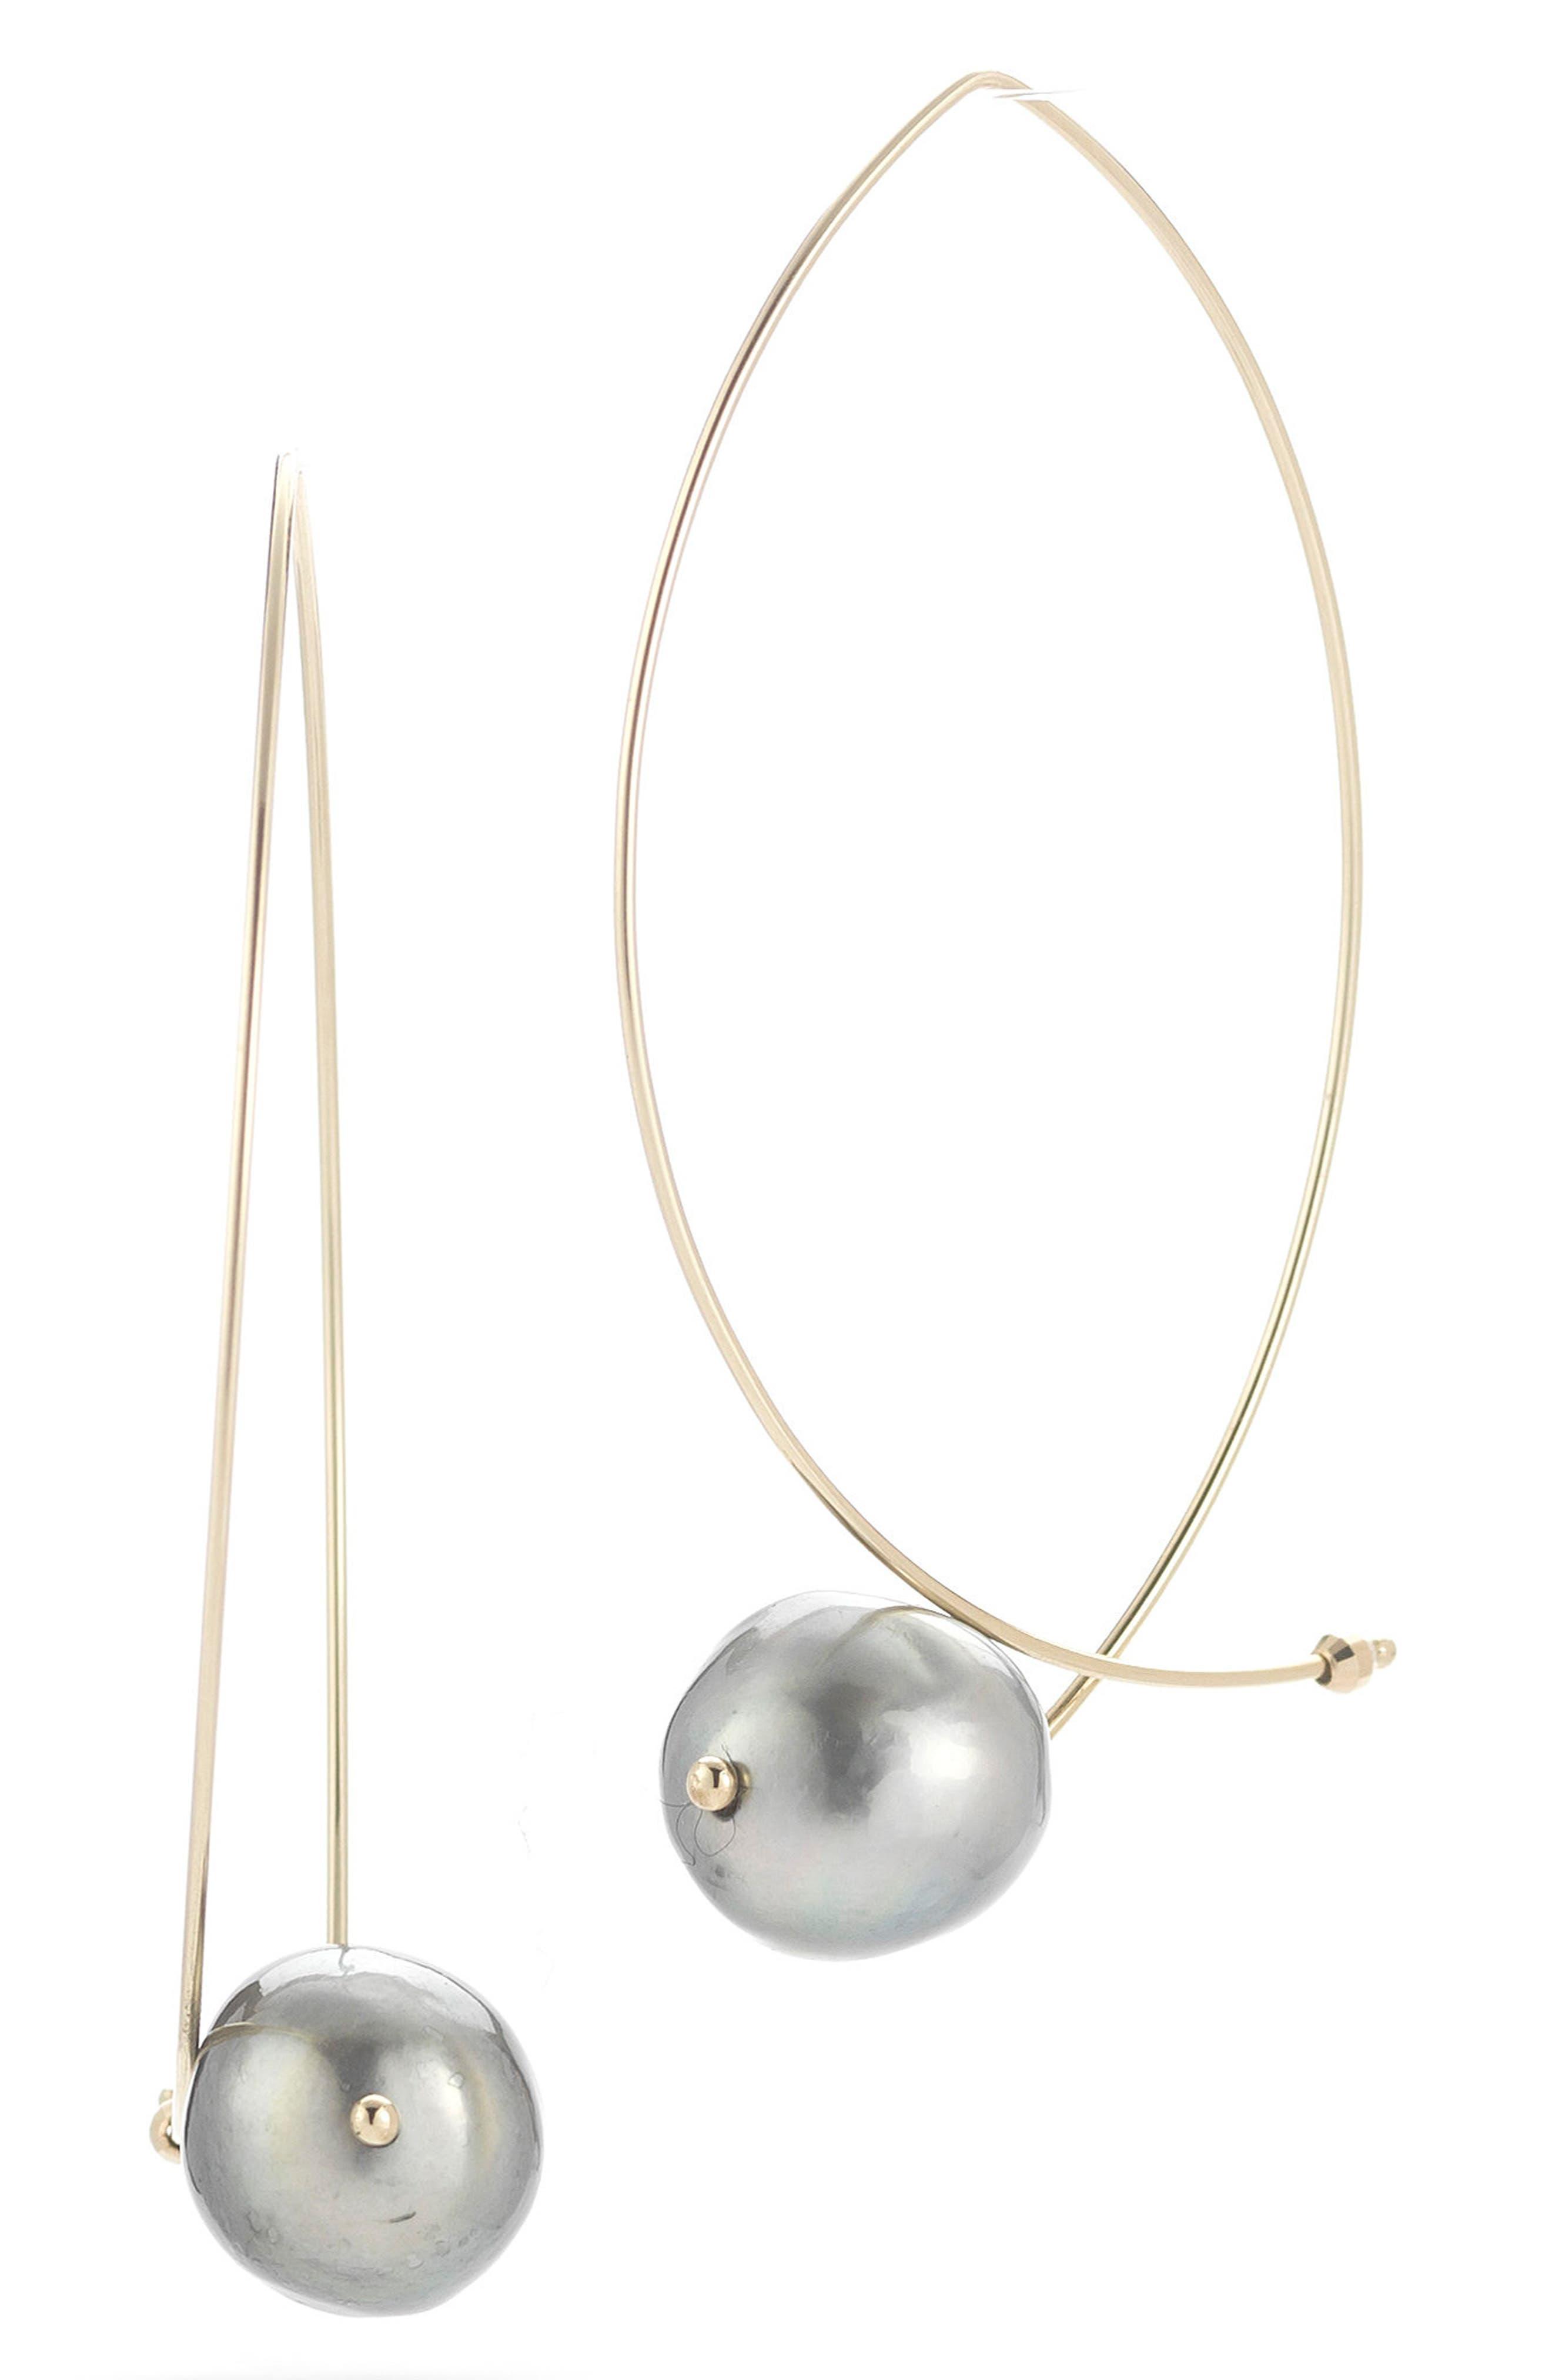 Sea of Beauty Tahitian Pearl Hoop Earrings,                         Main,                         color, Yellow Gold/ Gblack Pearl